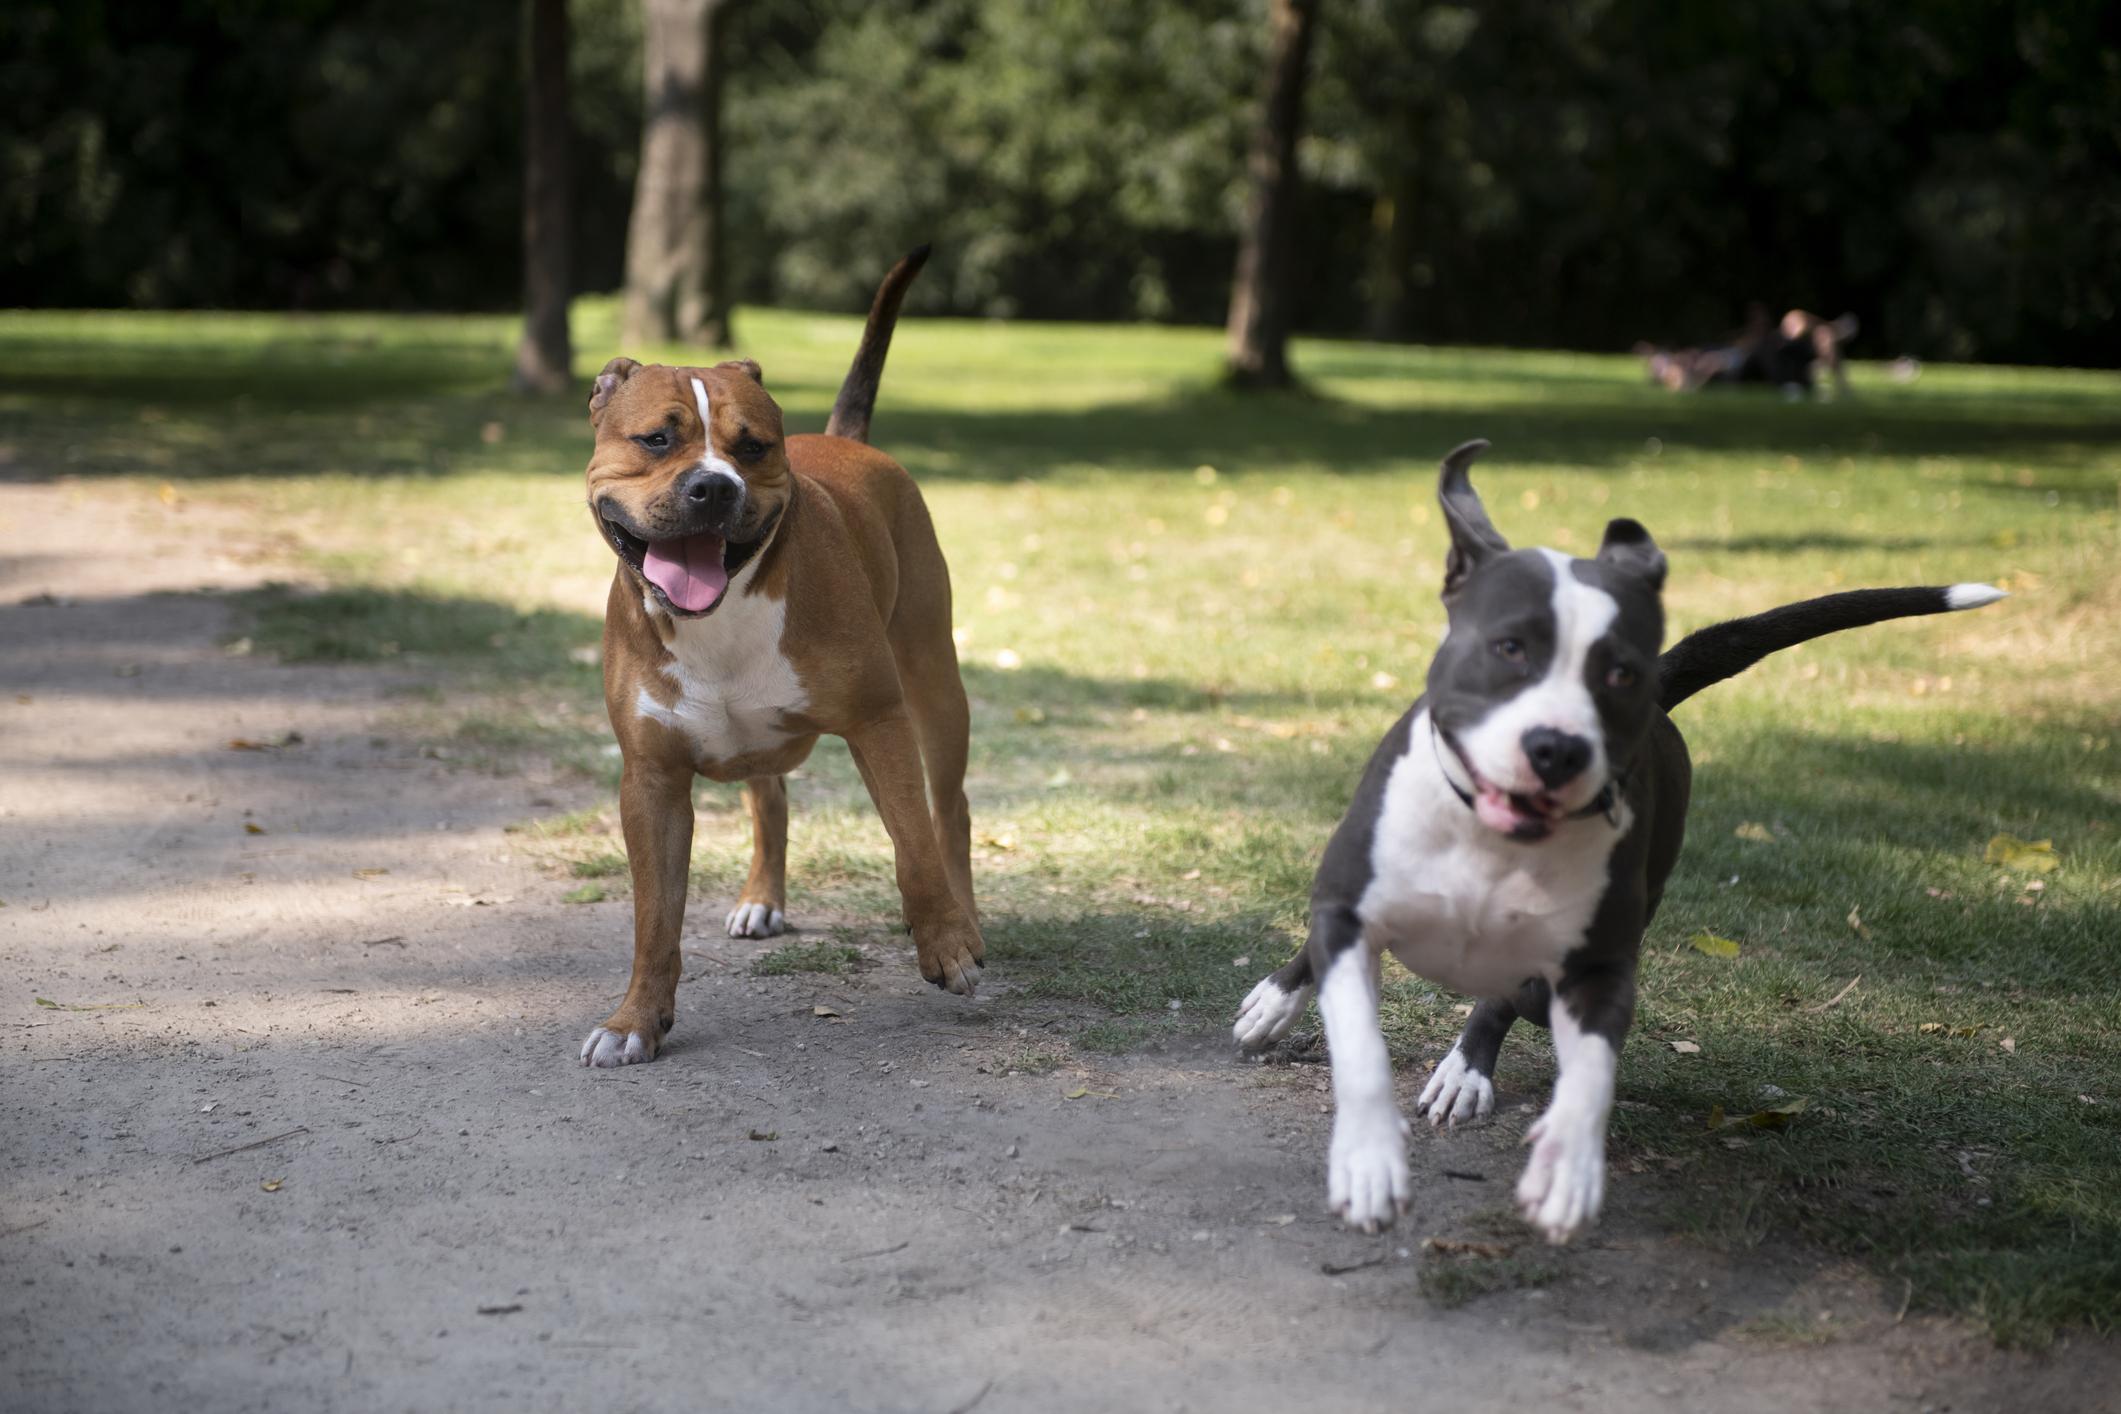 Jangan Pelihara Anjing Pitbull Sebelum Memahami 5 Hal Ini Rumah123 Com